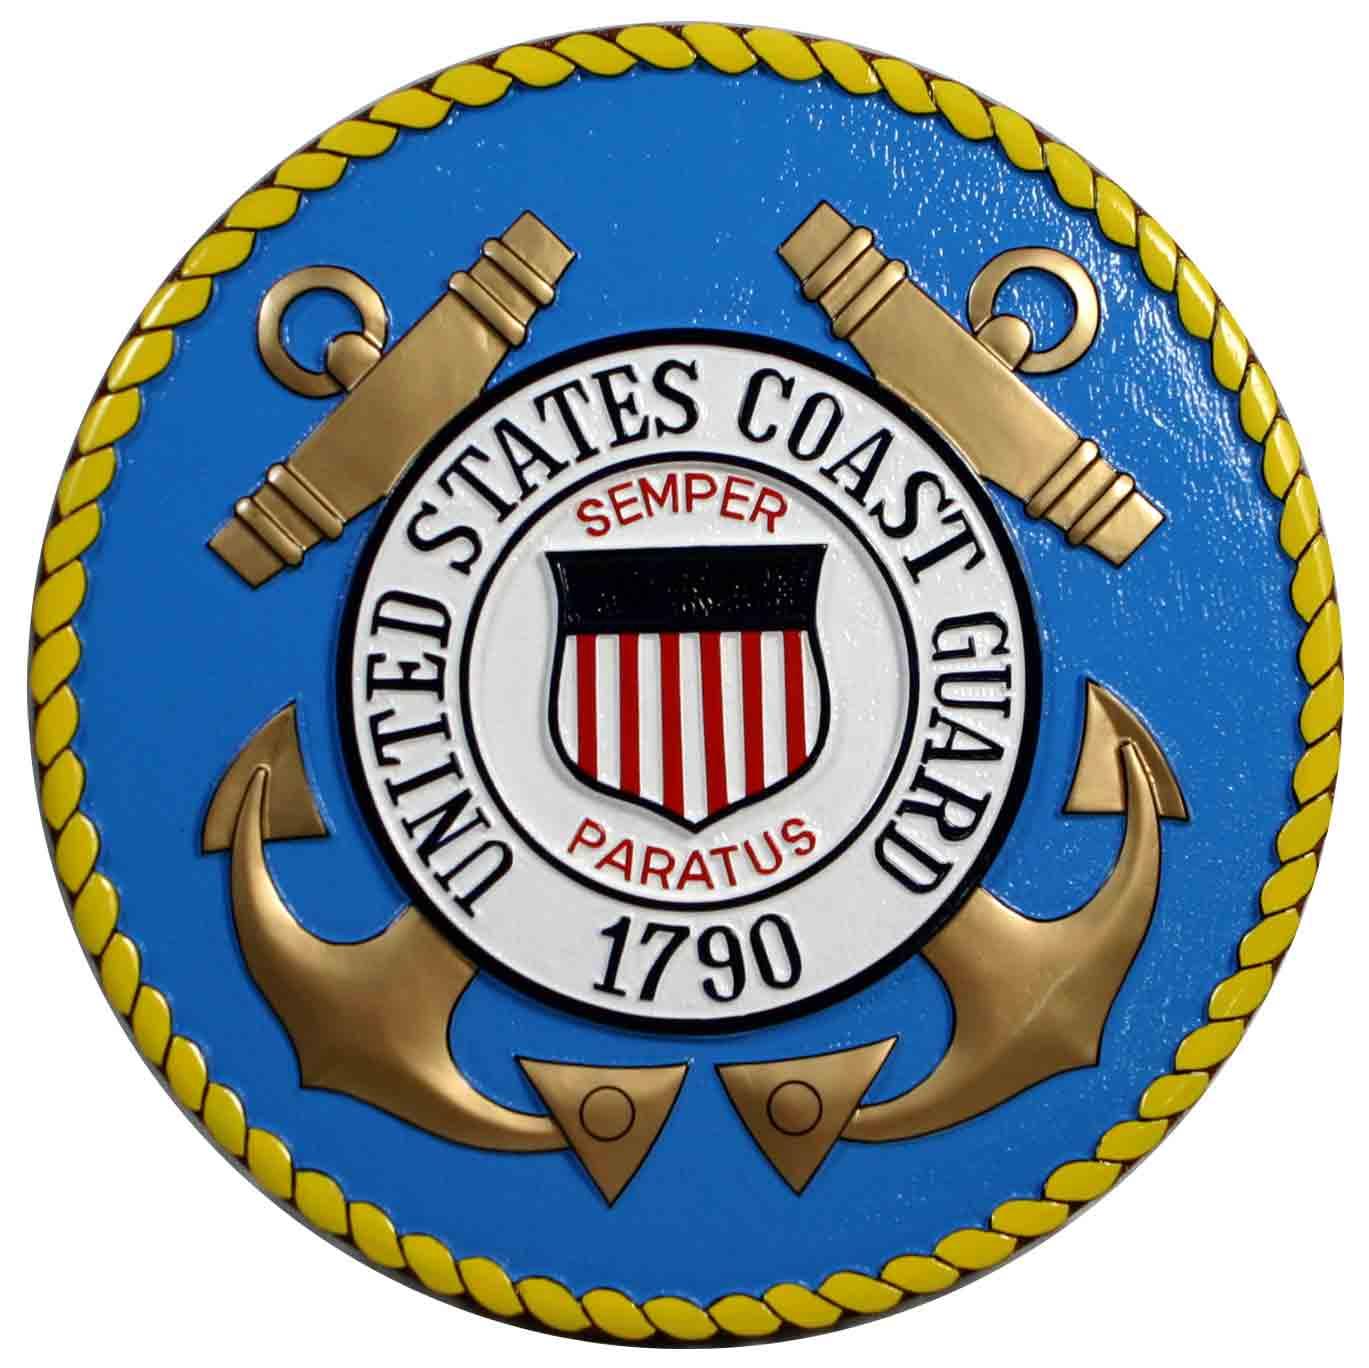 Cg.seal